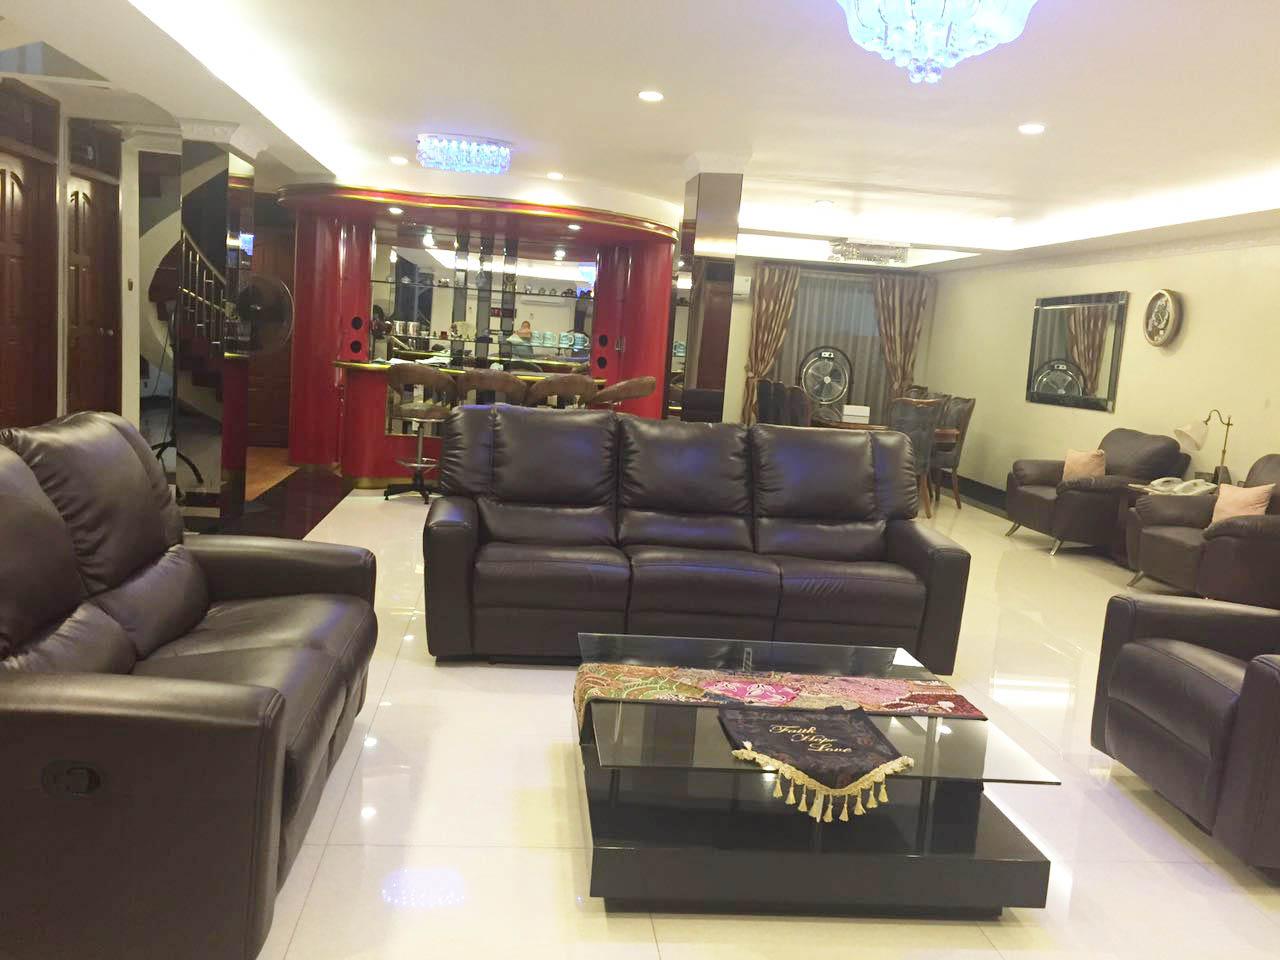 Rumah di Jual Cempaka Putih Tengah-Jakarta Pusat